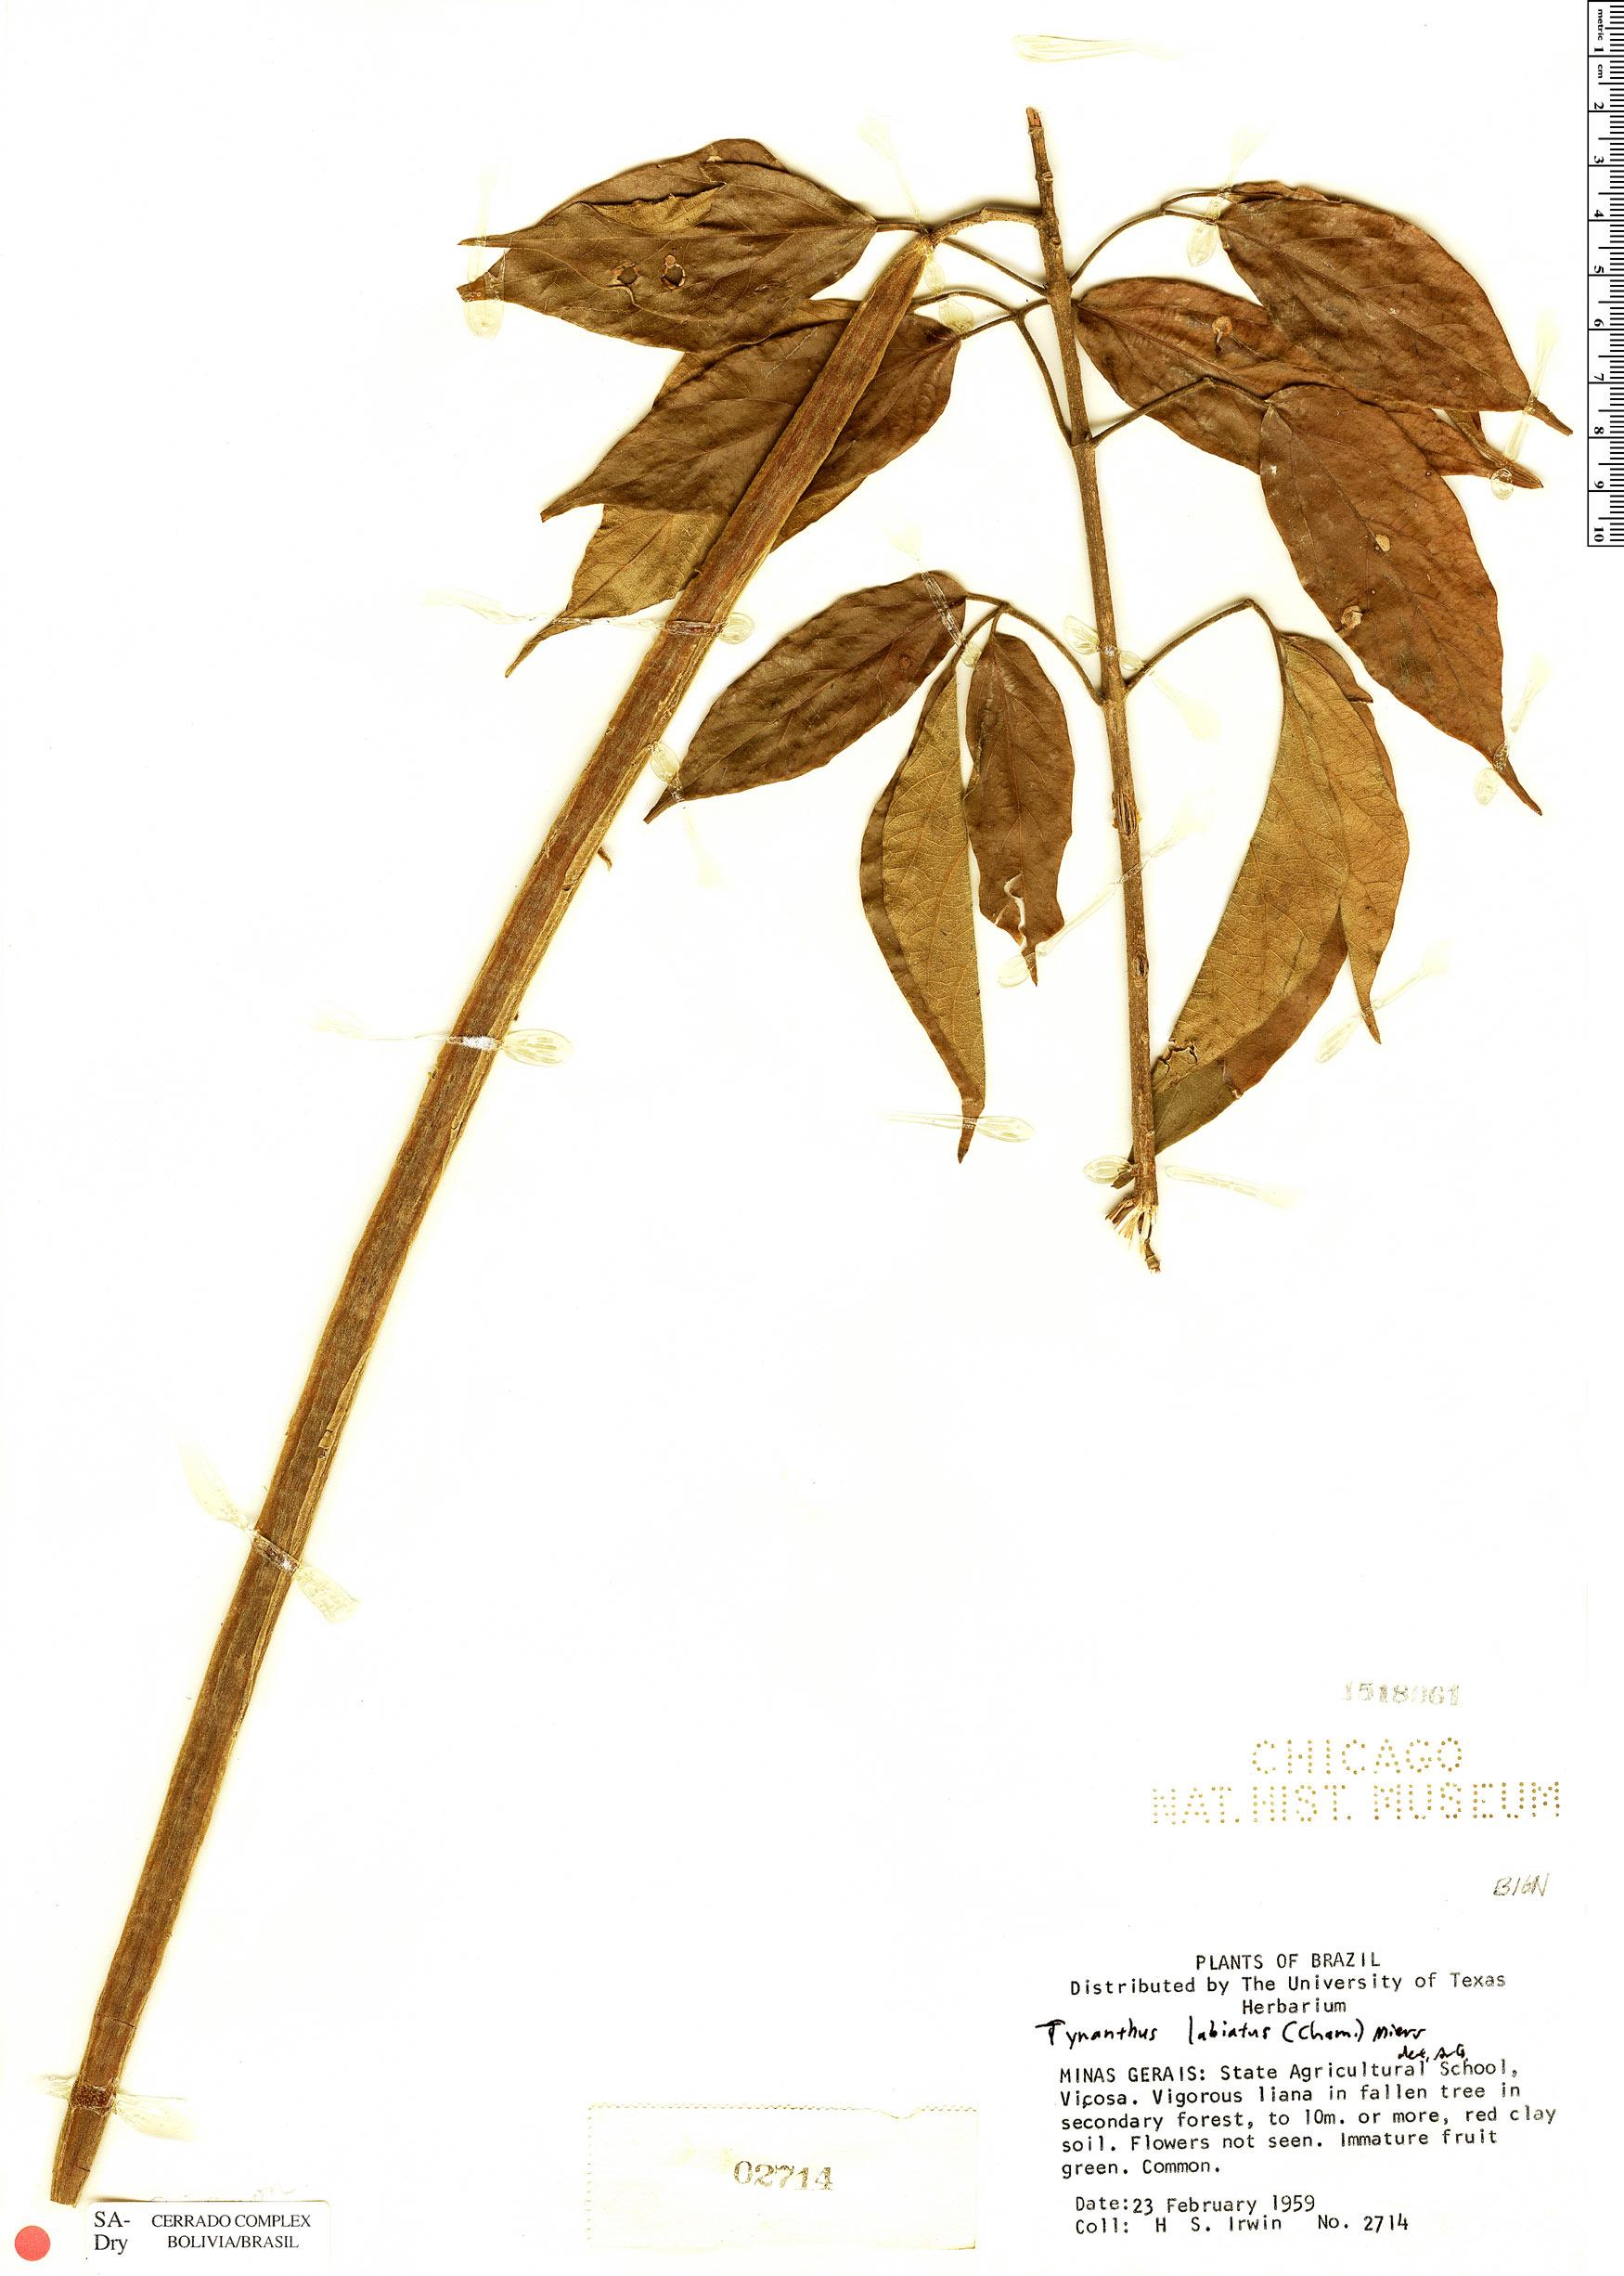 Espécimen: Tynanthus labiatus